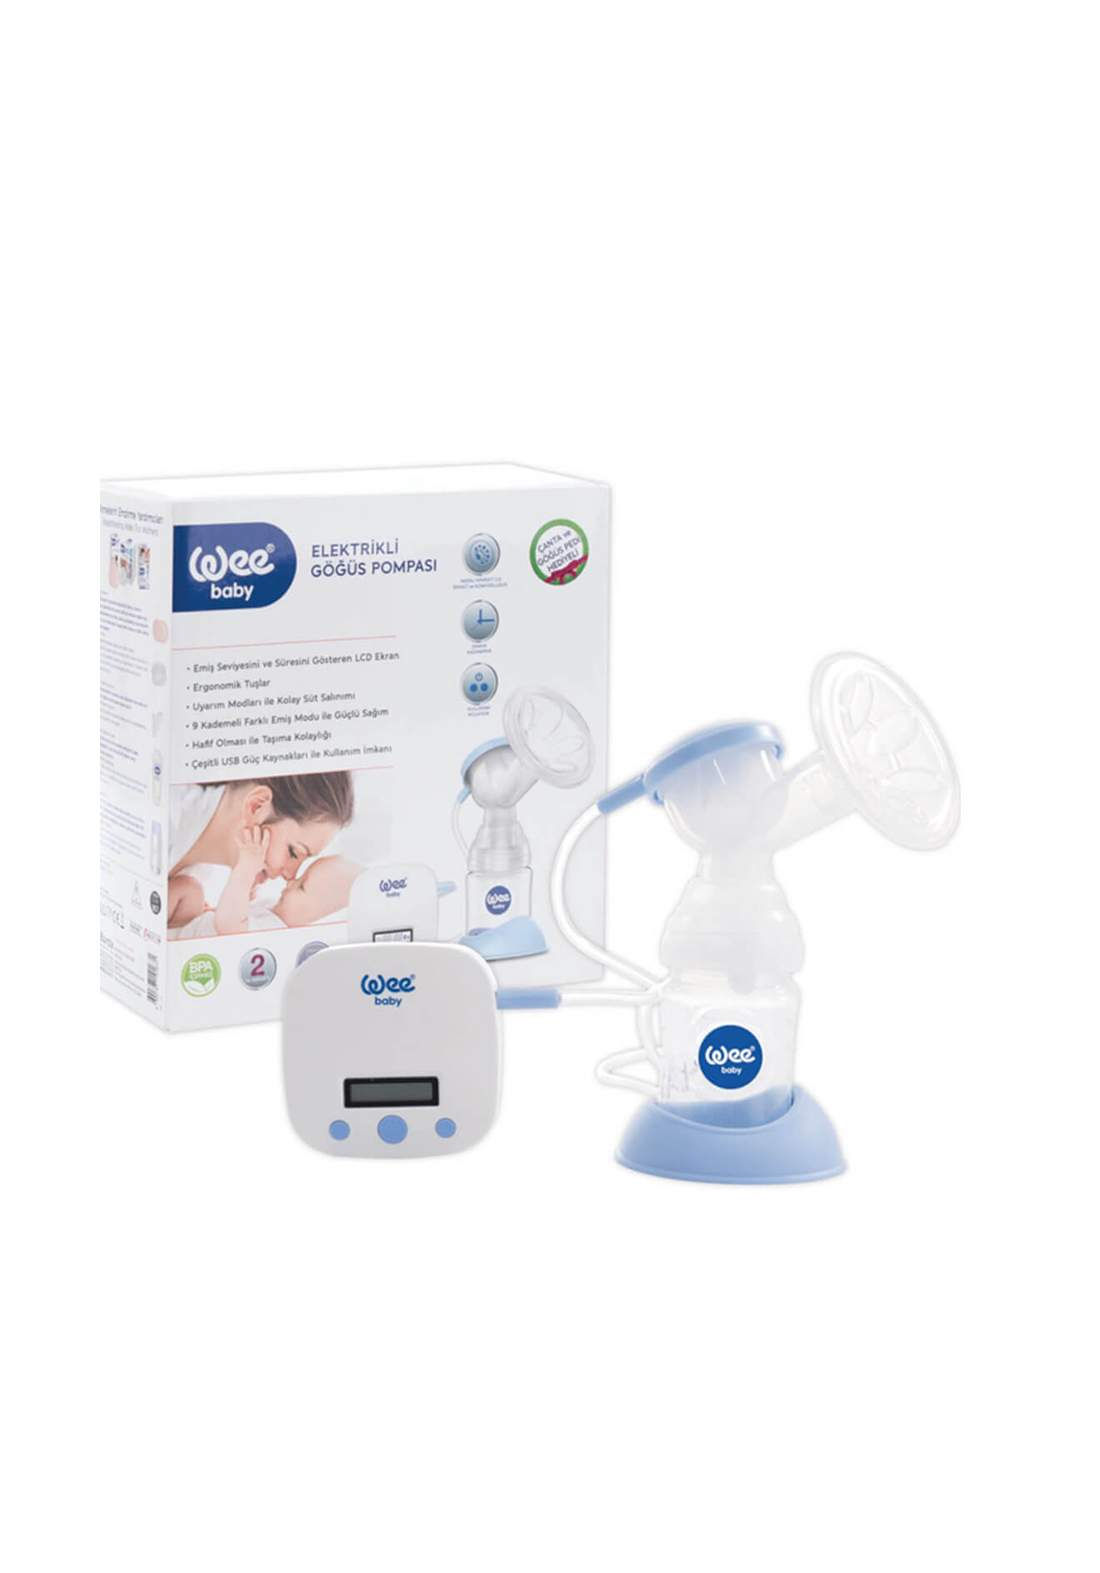 Wee Baby 167 Electronic Breast Pump شافطة حليب الالكترونية